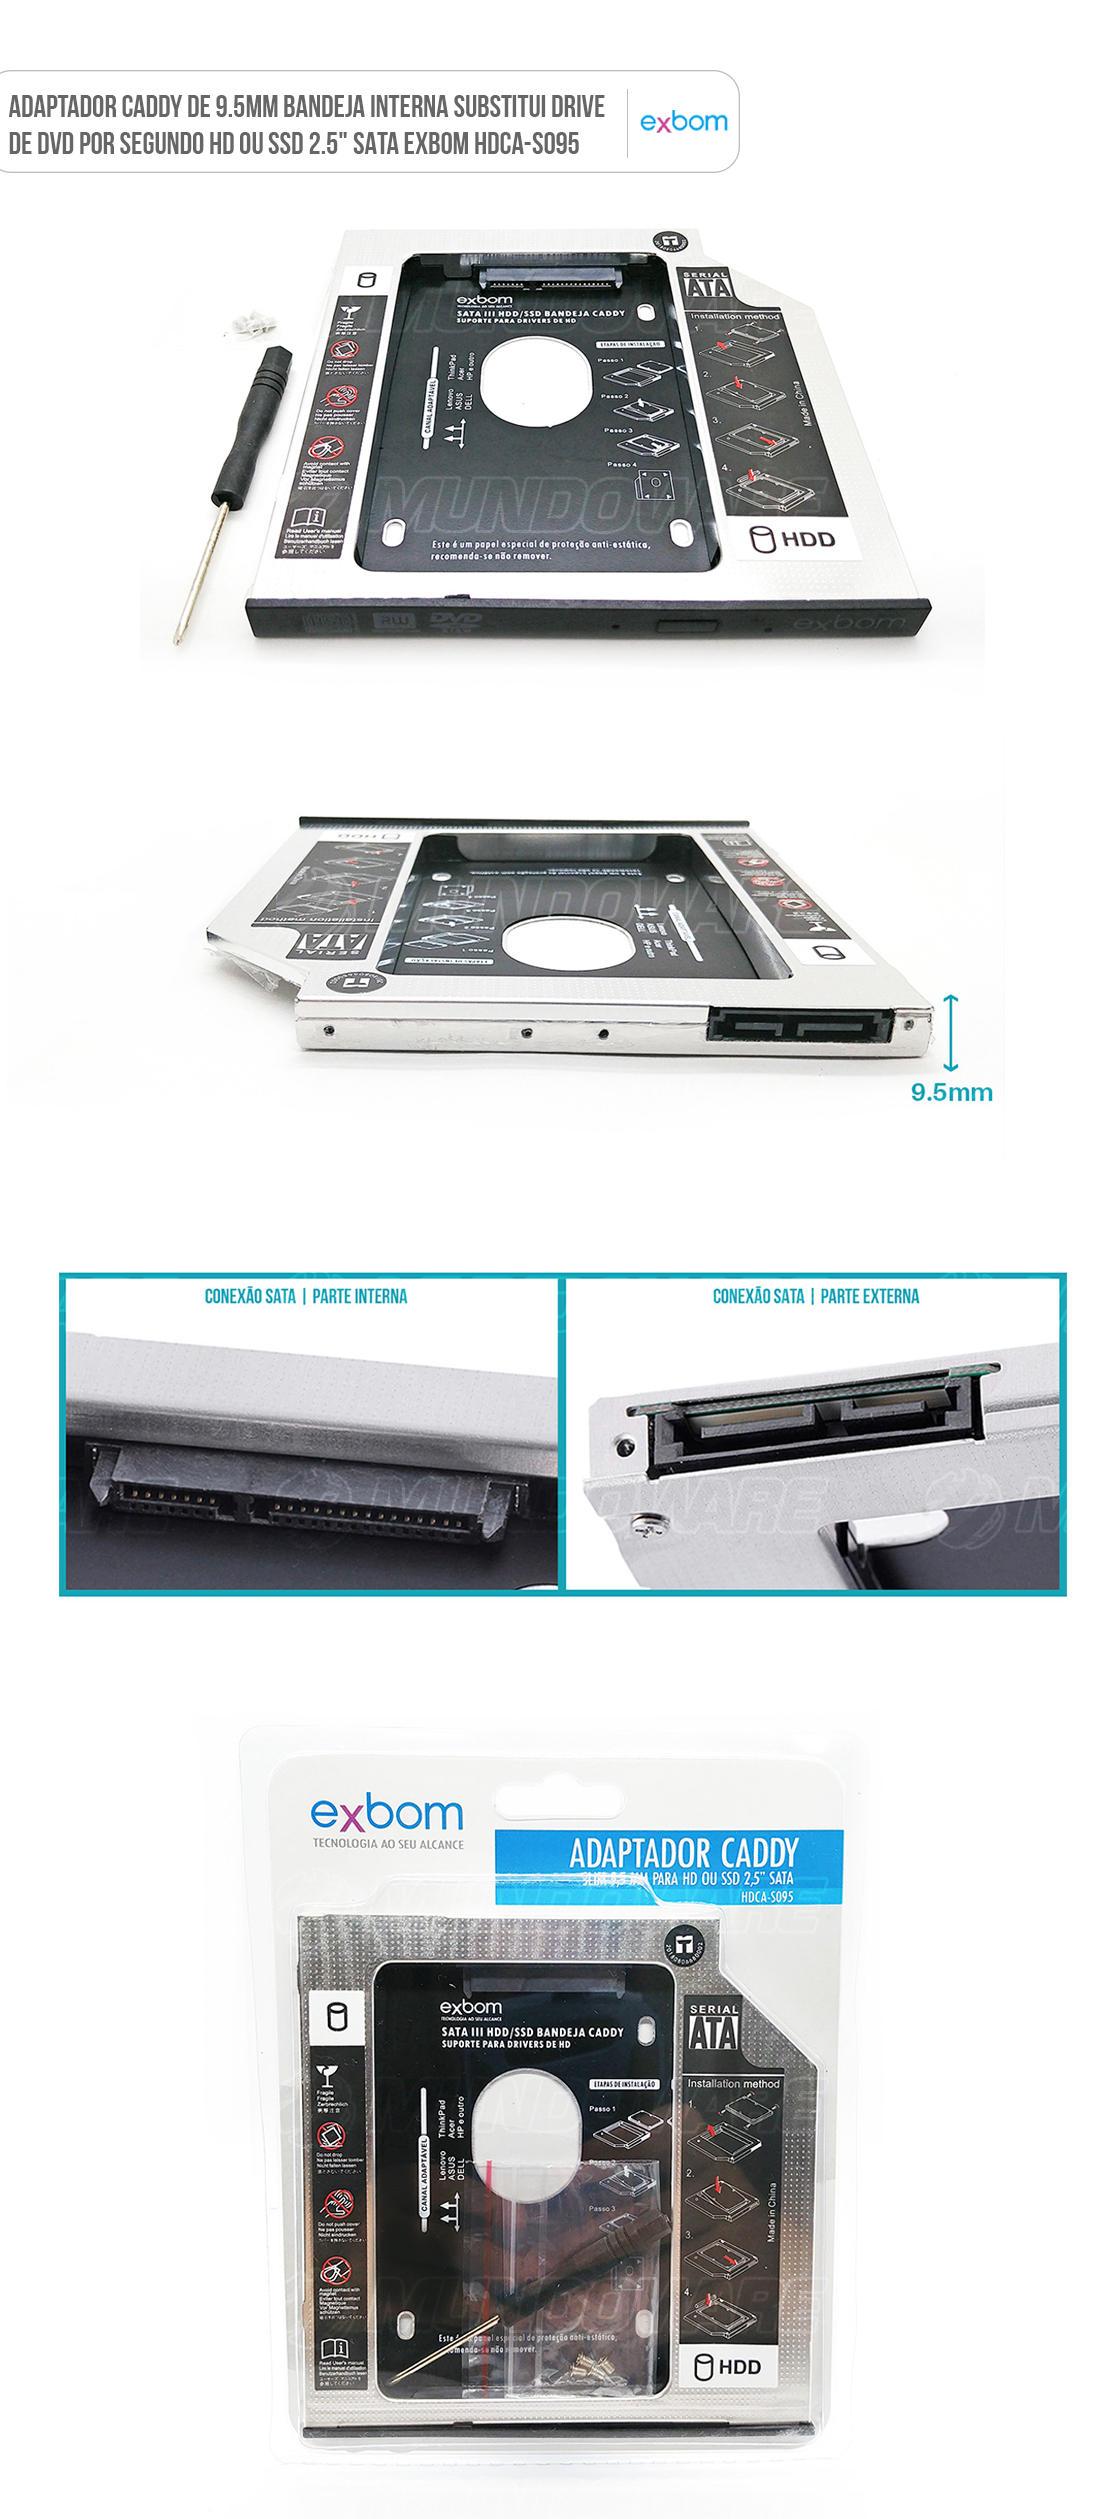 Bandeja Caddy para substituir drive DVD por segundo HD ou SSD de 9.5mm